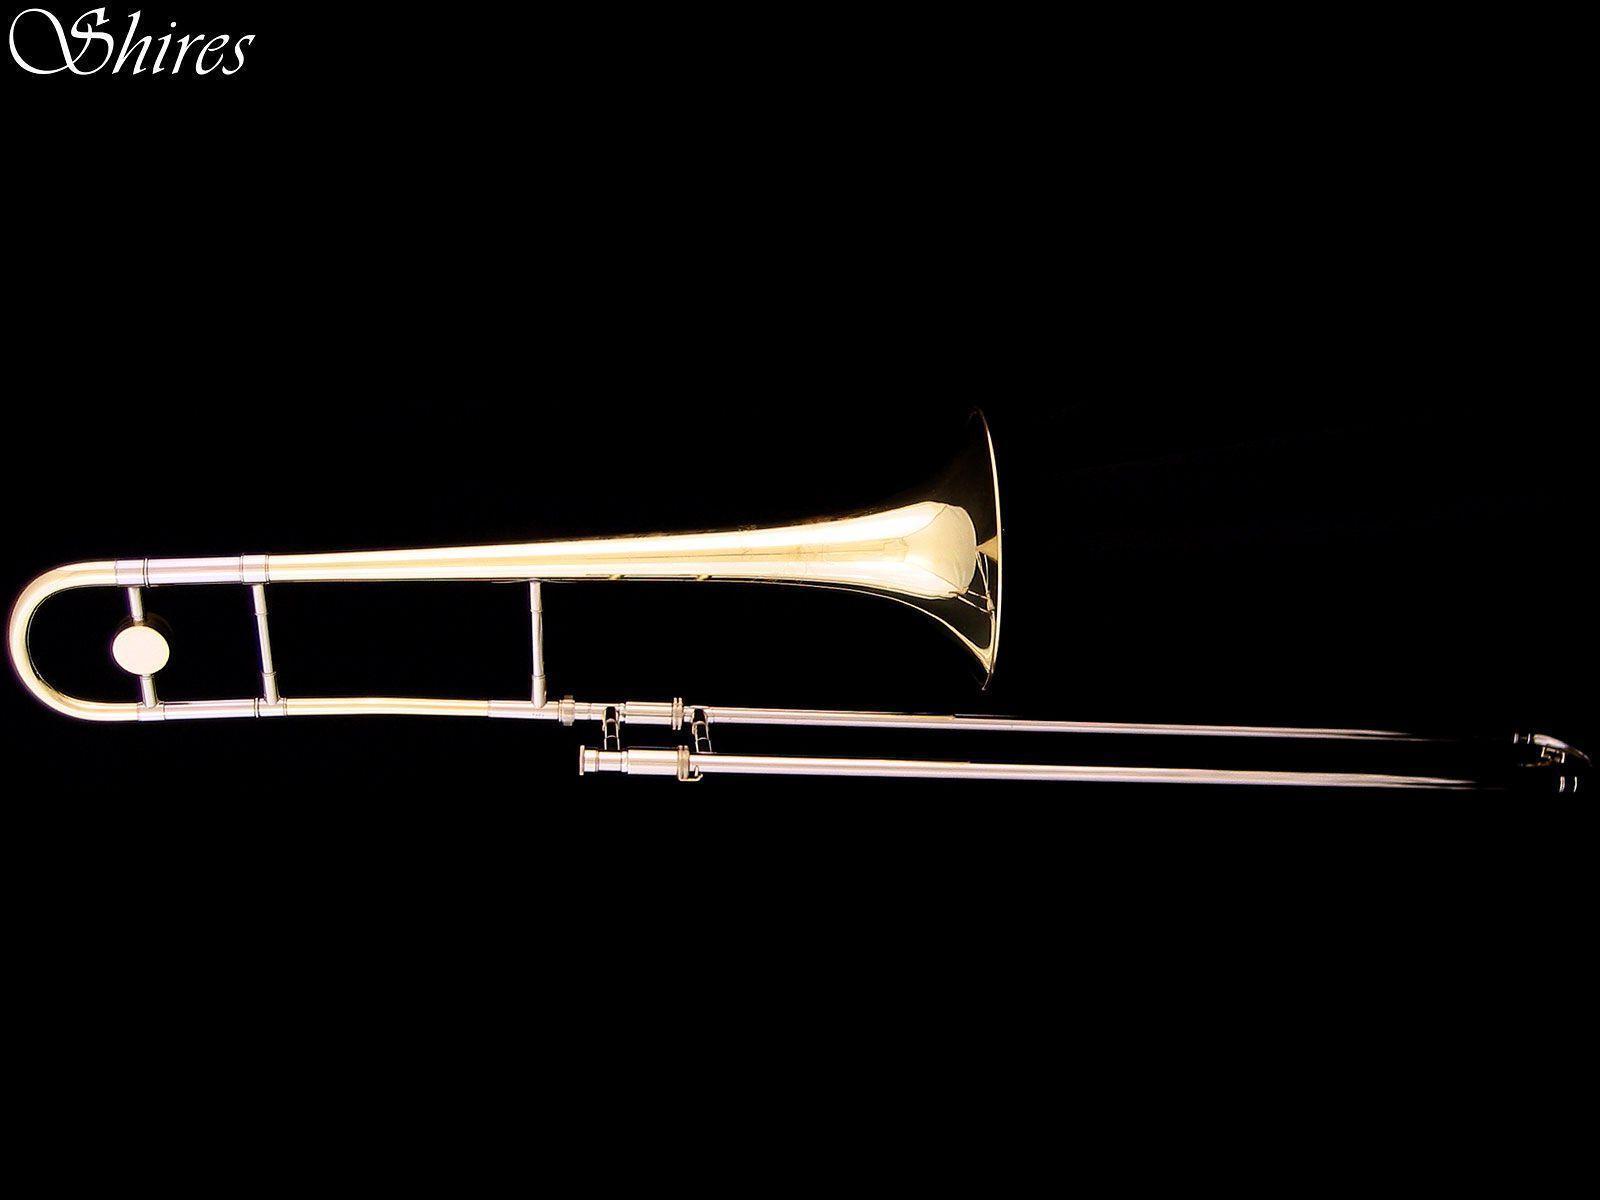 3d Jazz Music Wallpapers: Trombone Wallpapers